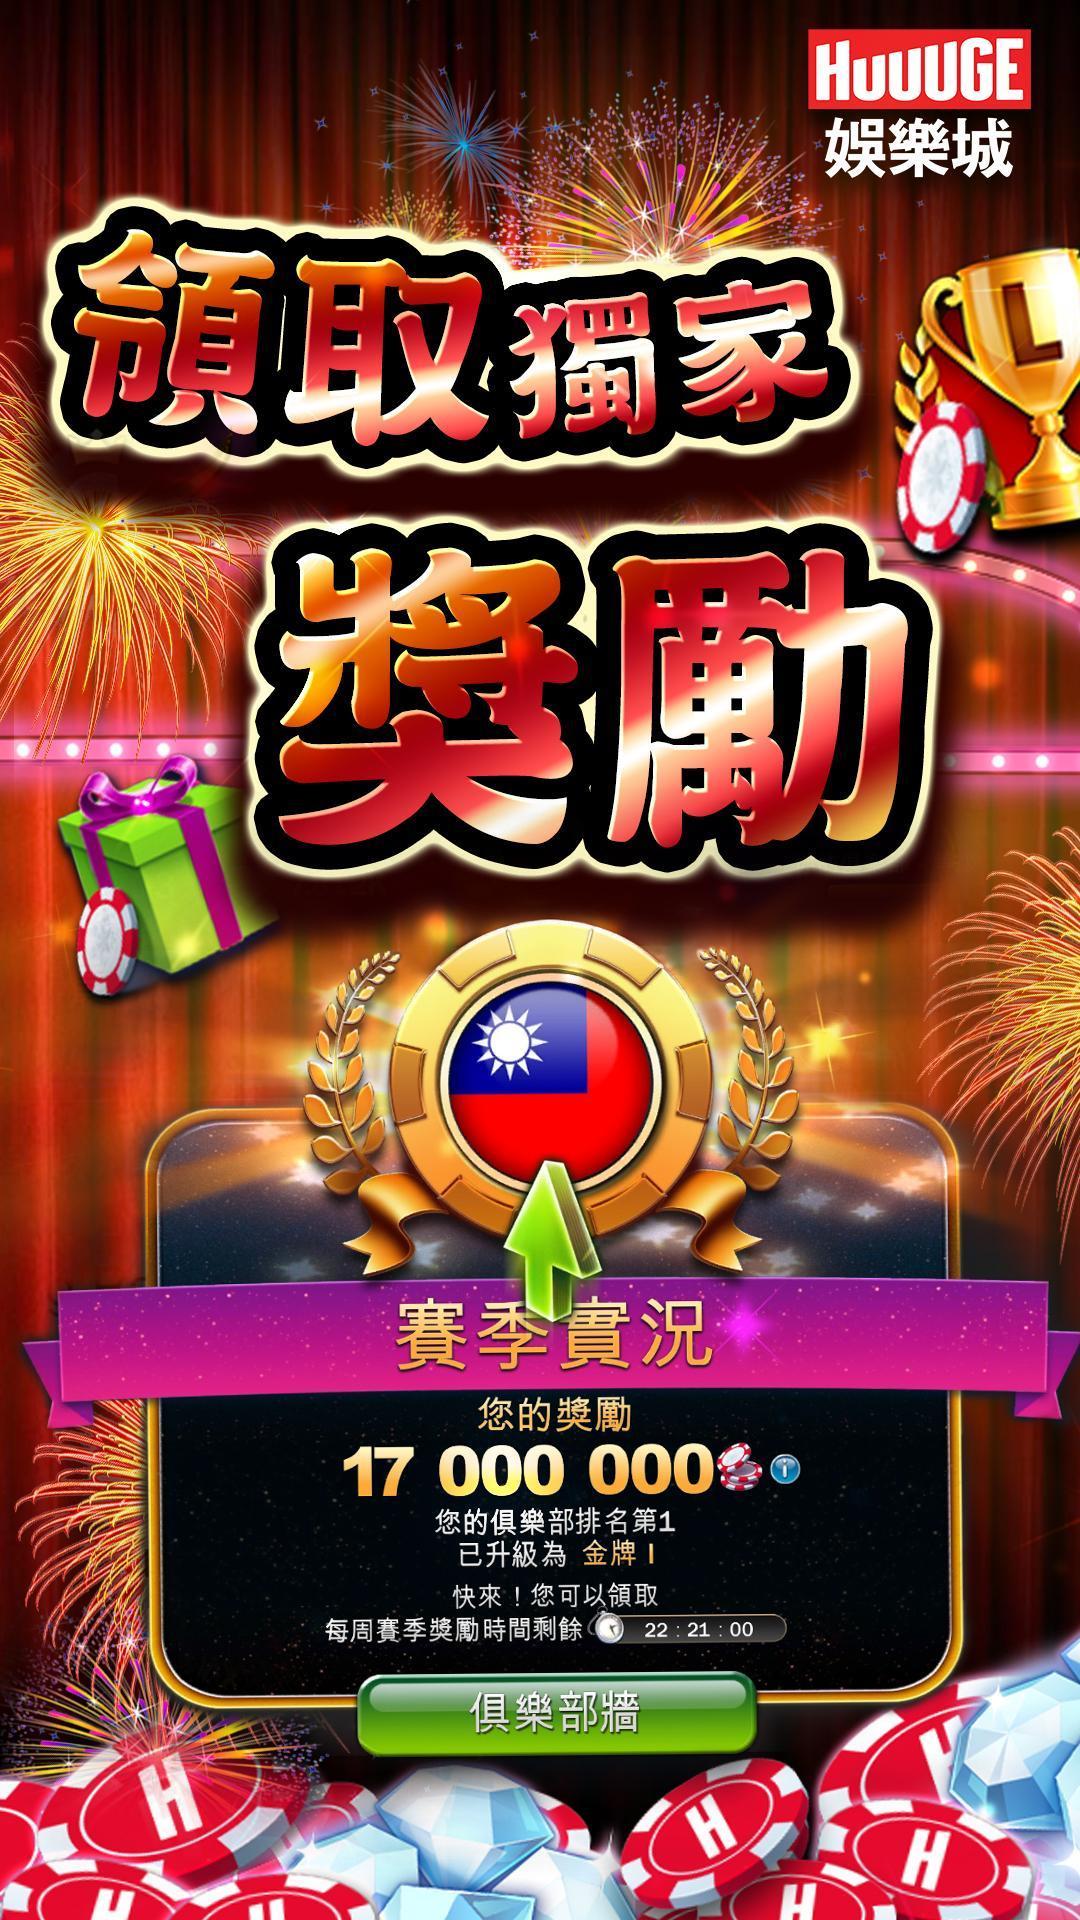 Slotter casino lobby demo spiel